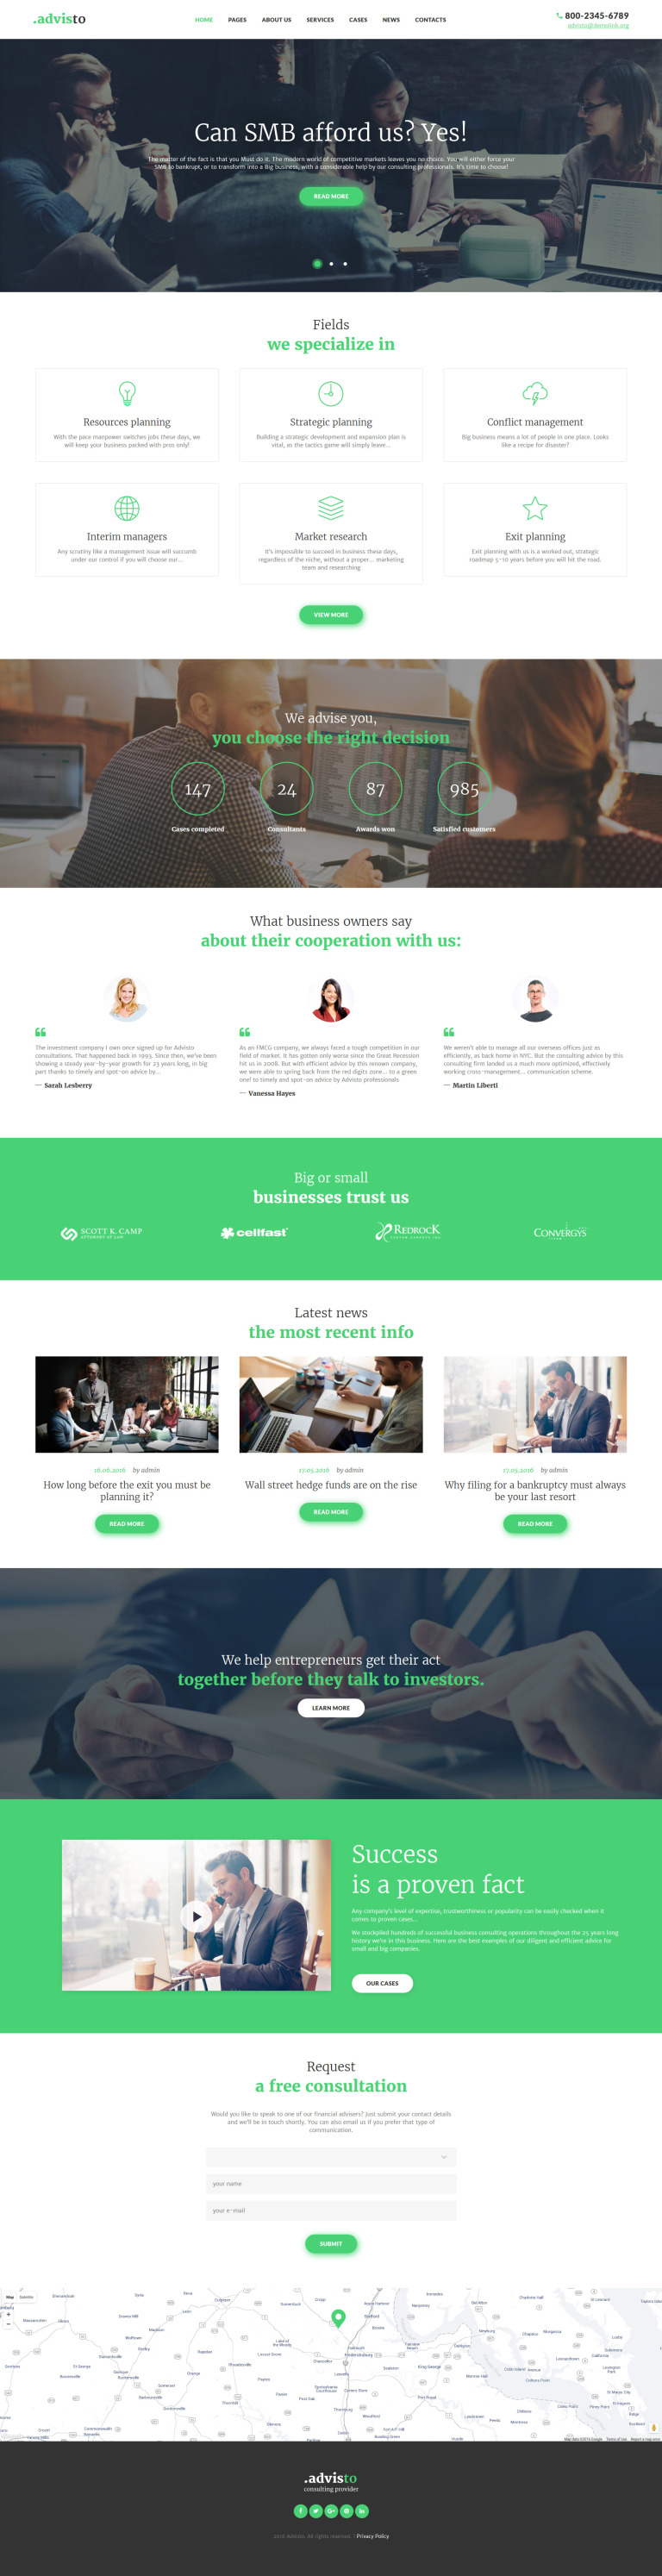 Advisto - Financial Advisor Consultancy WordPress Theme New Screenshots BIG